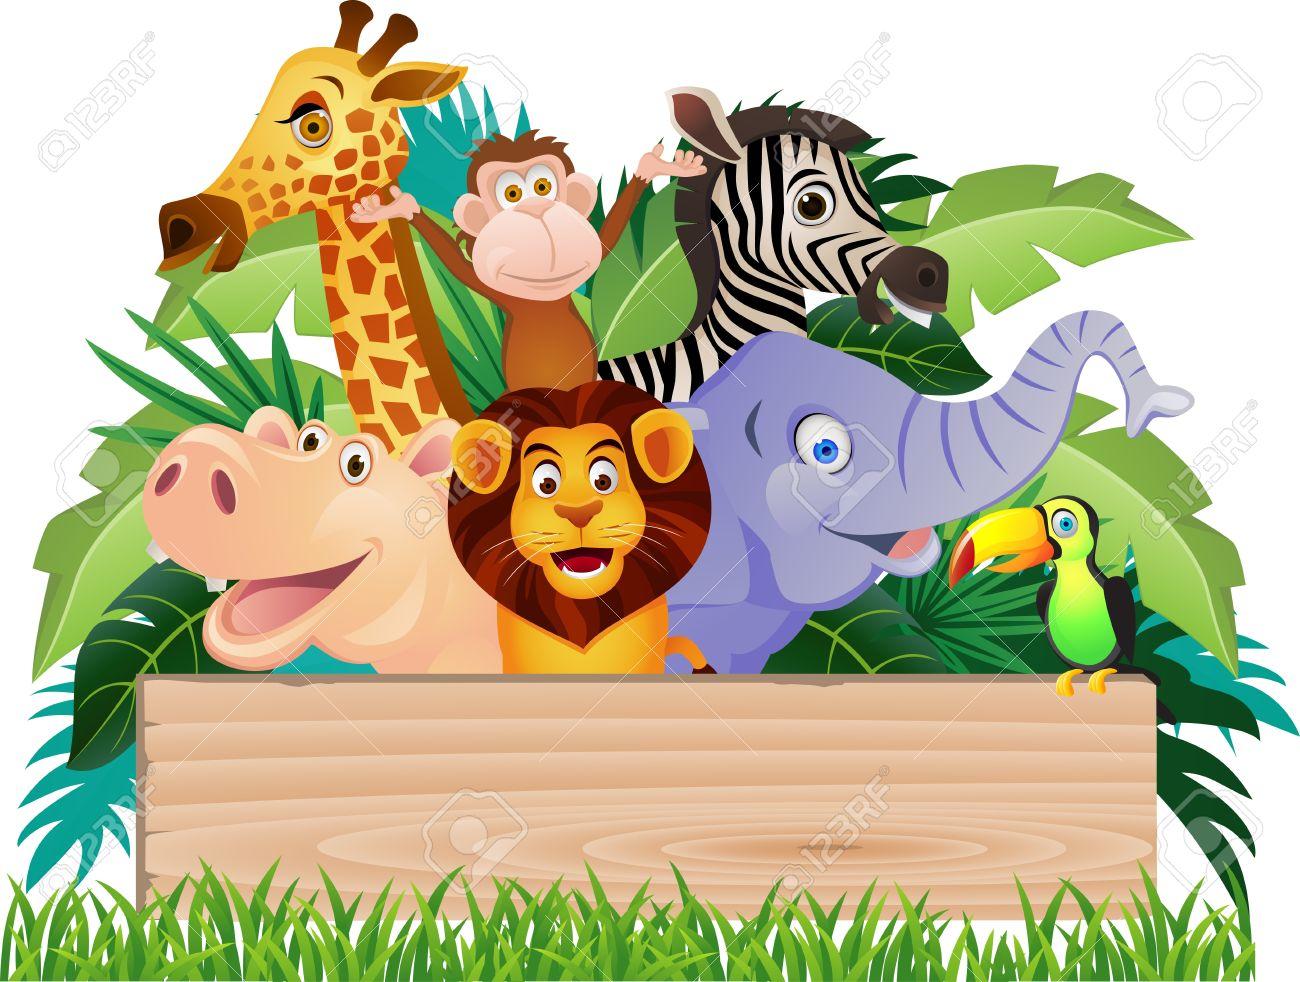 Animal cartoon Stock Photo - 12152654